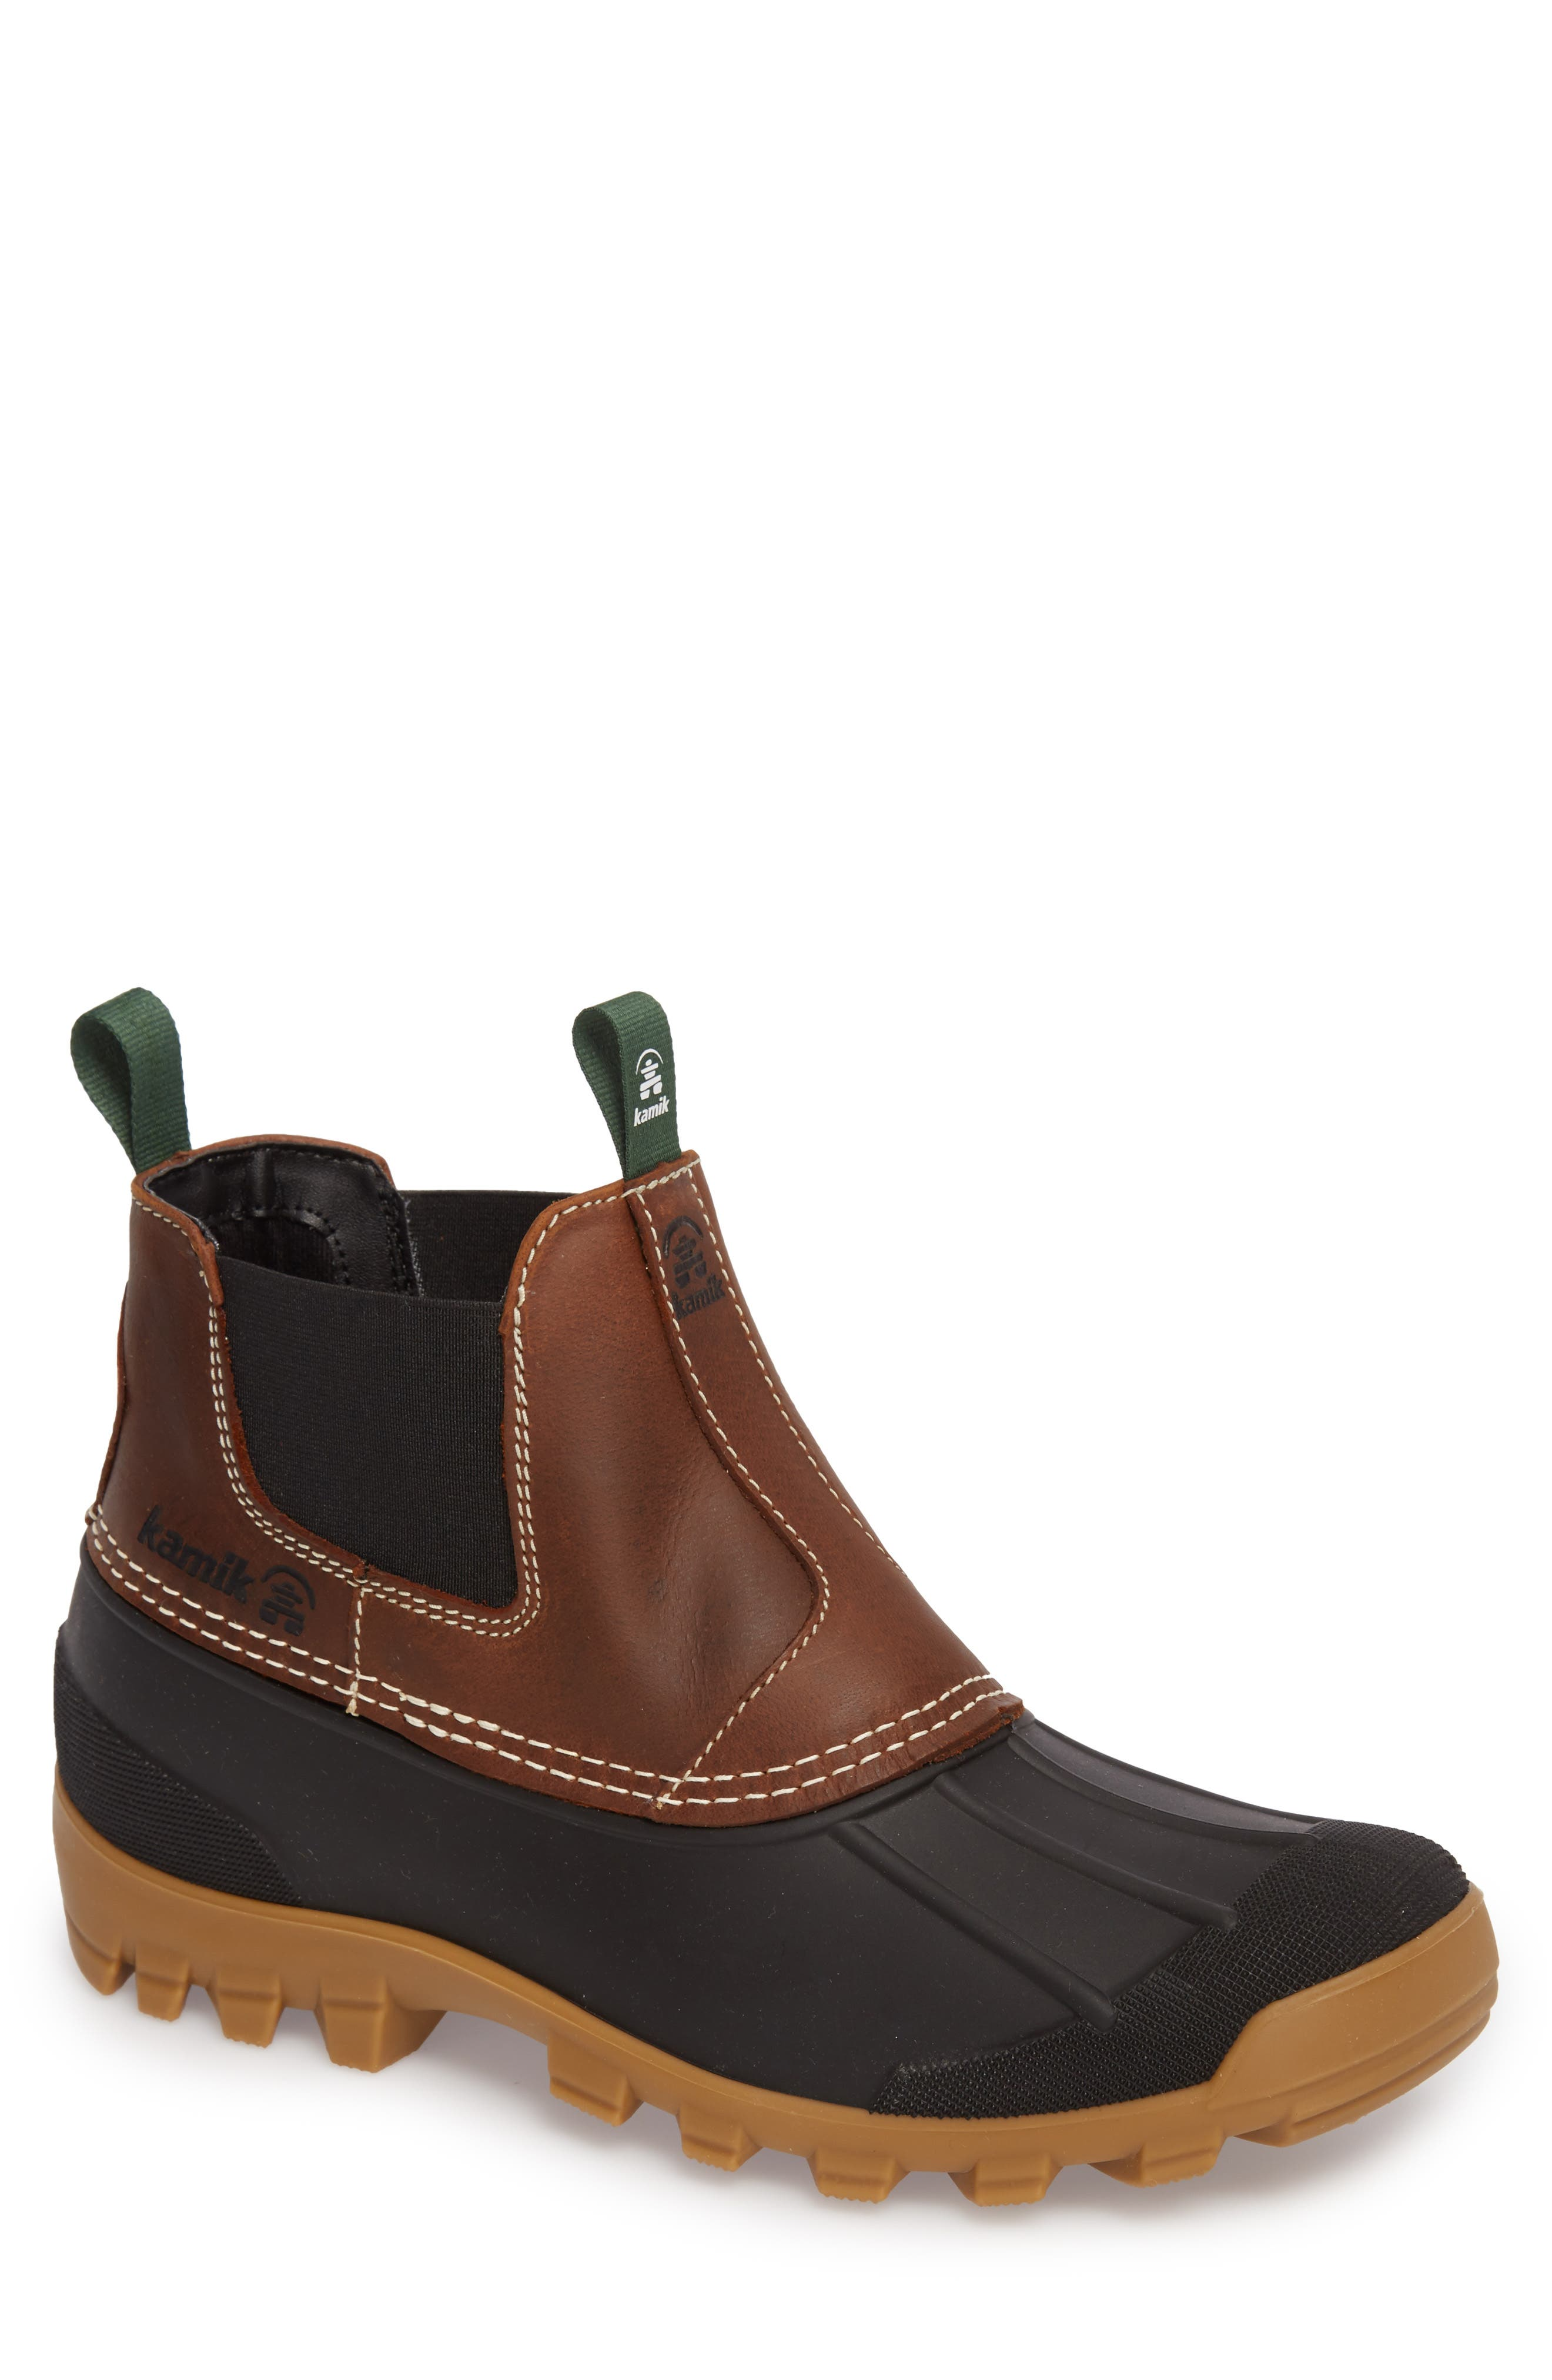 Yukon Chelsea Boot,                             Main thumbnail 1, color,                             Dark Brown Leather